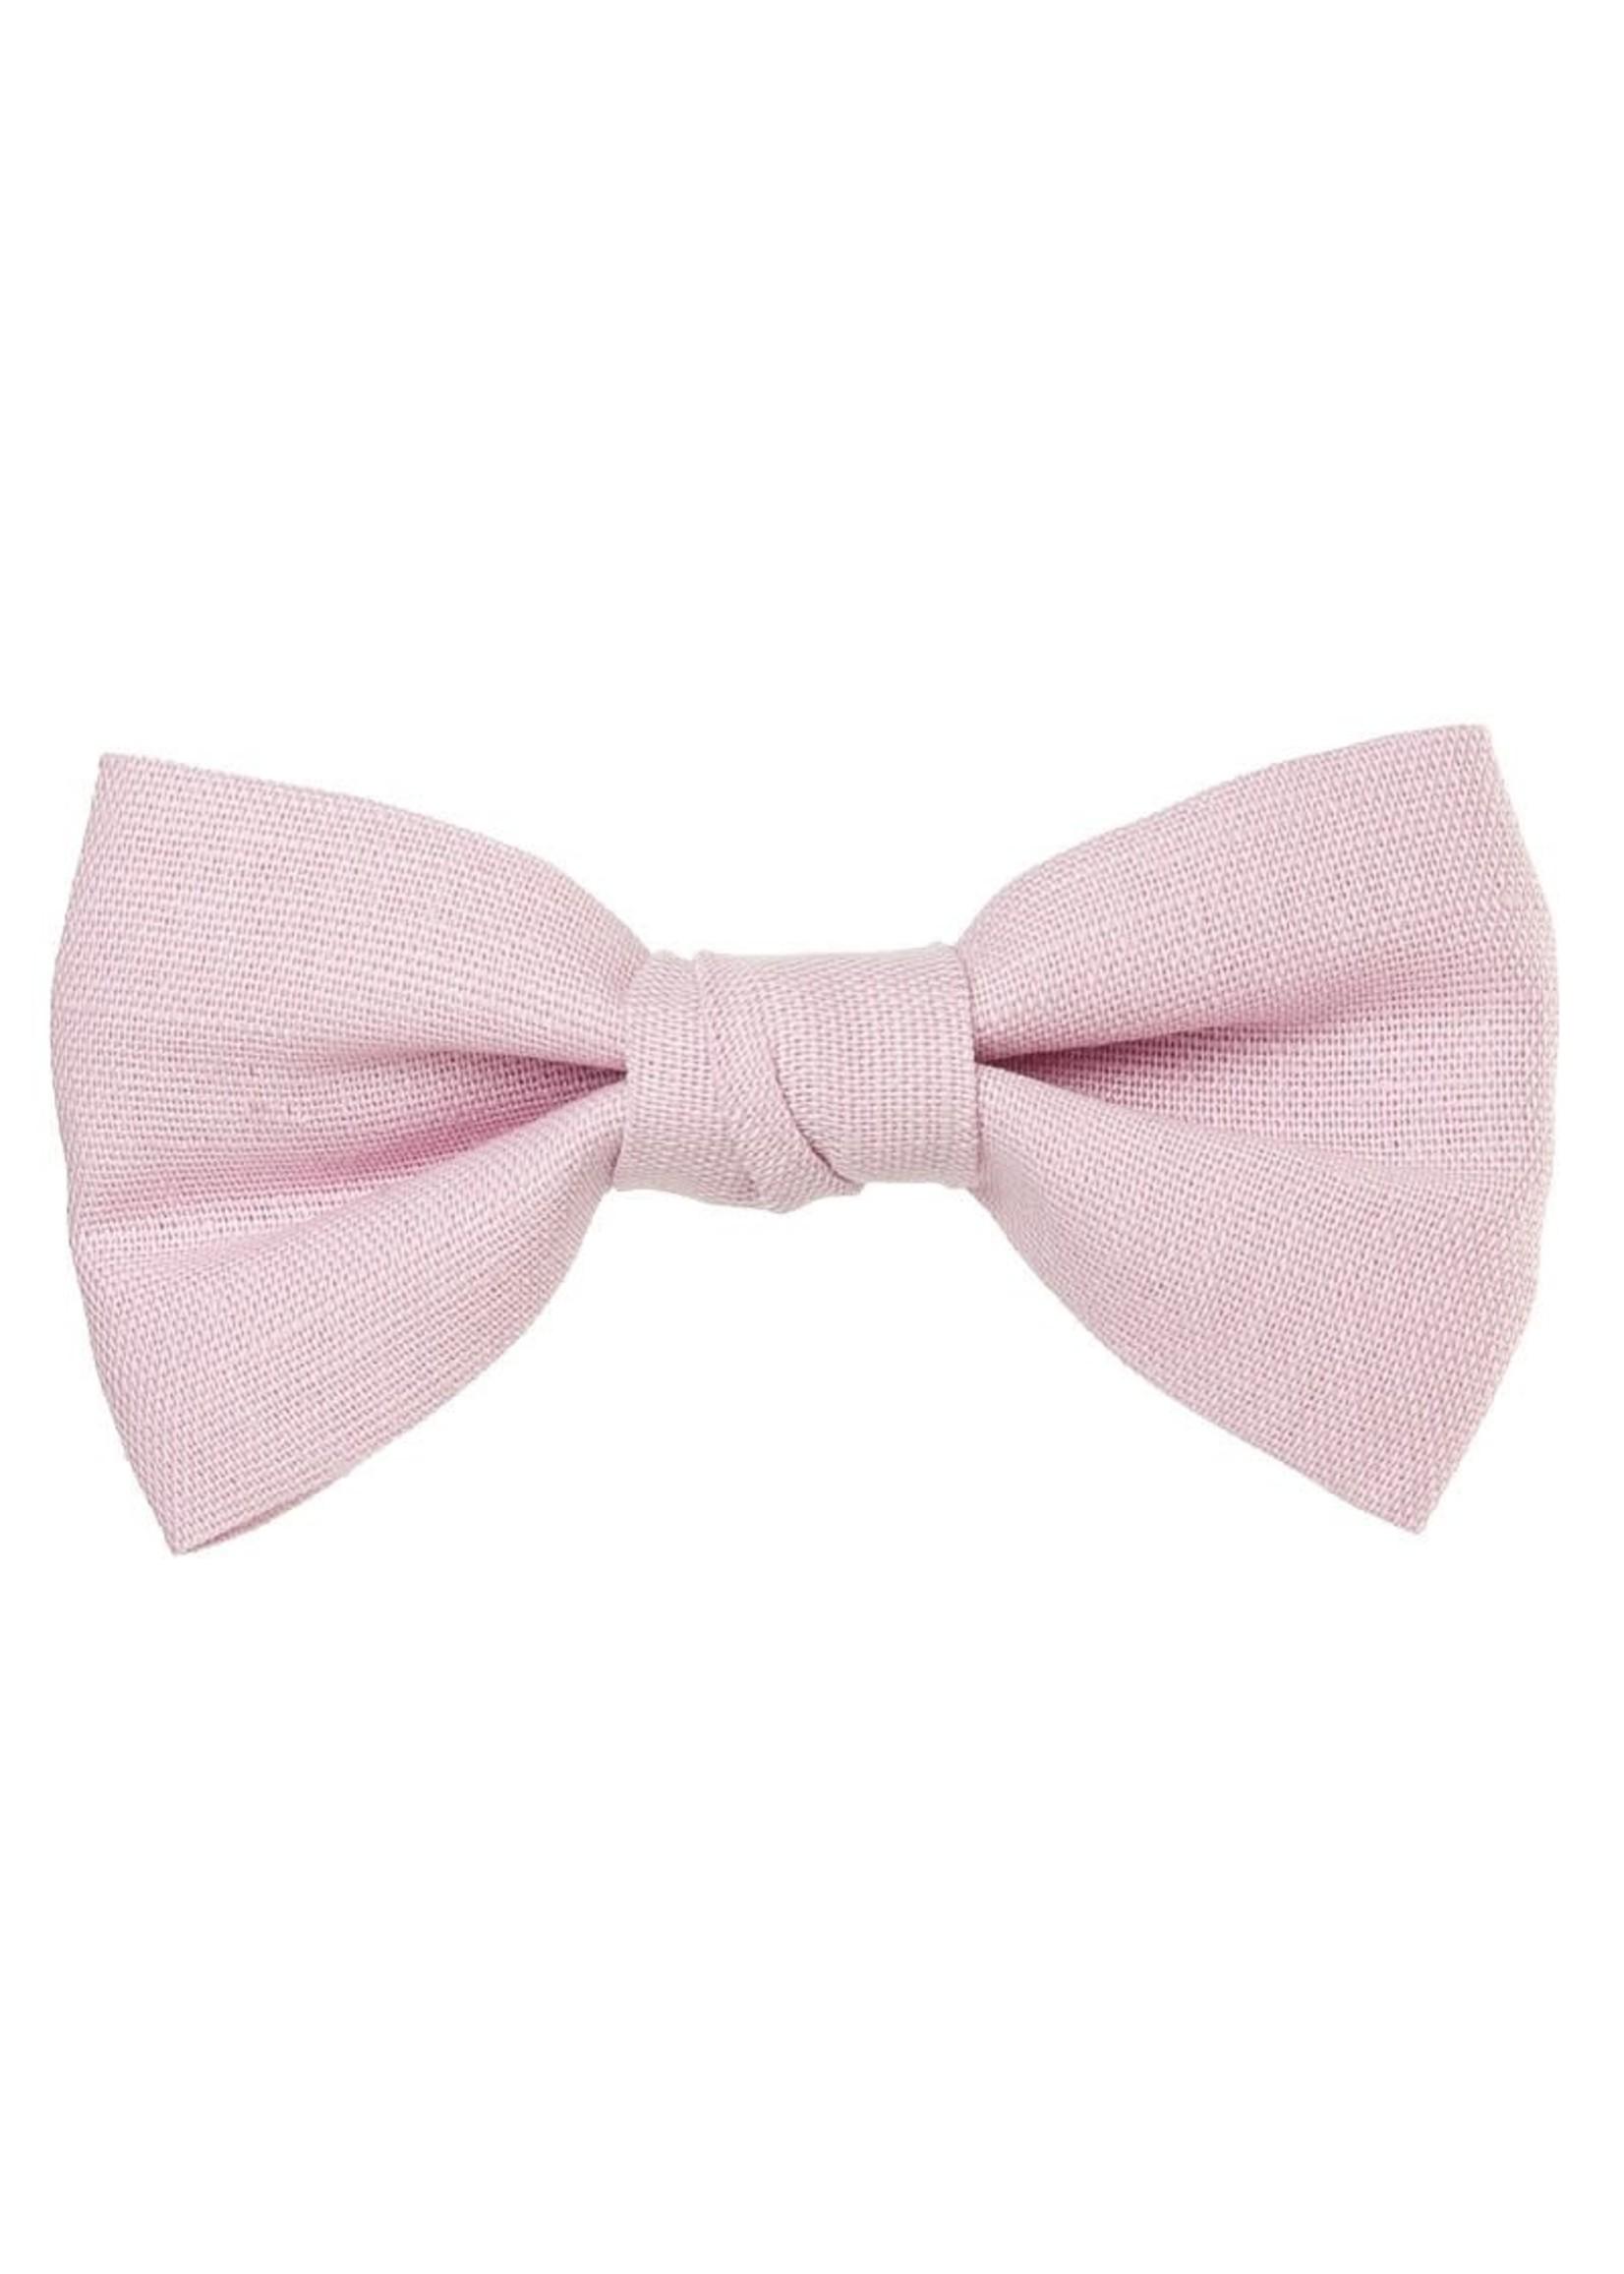 Siena SIENA Clip linnen strik roze